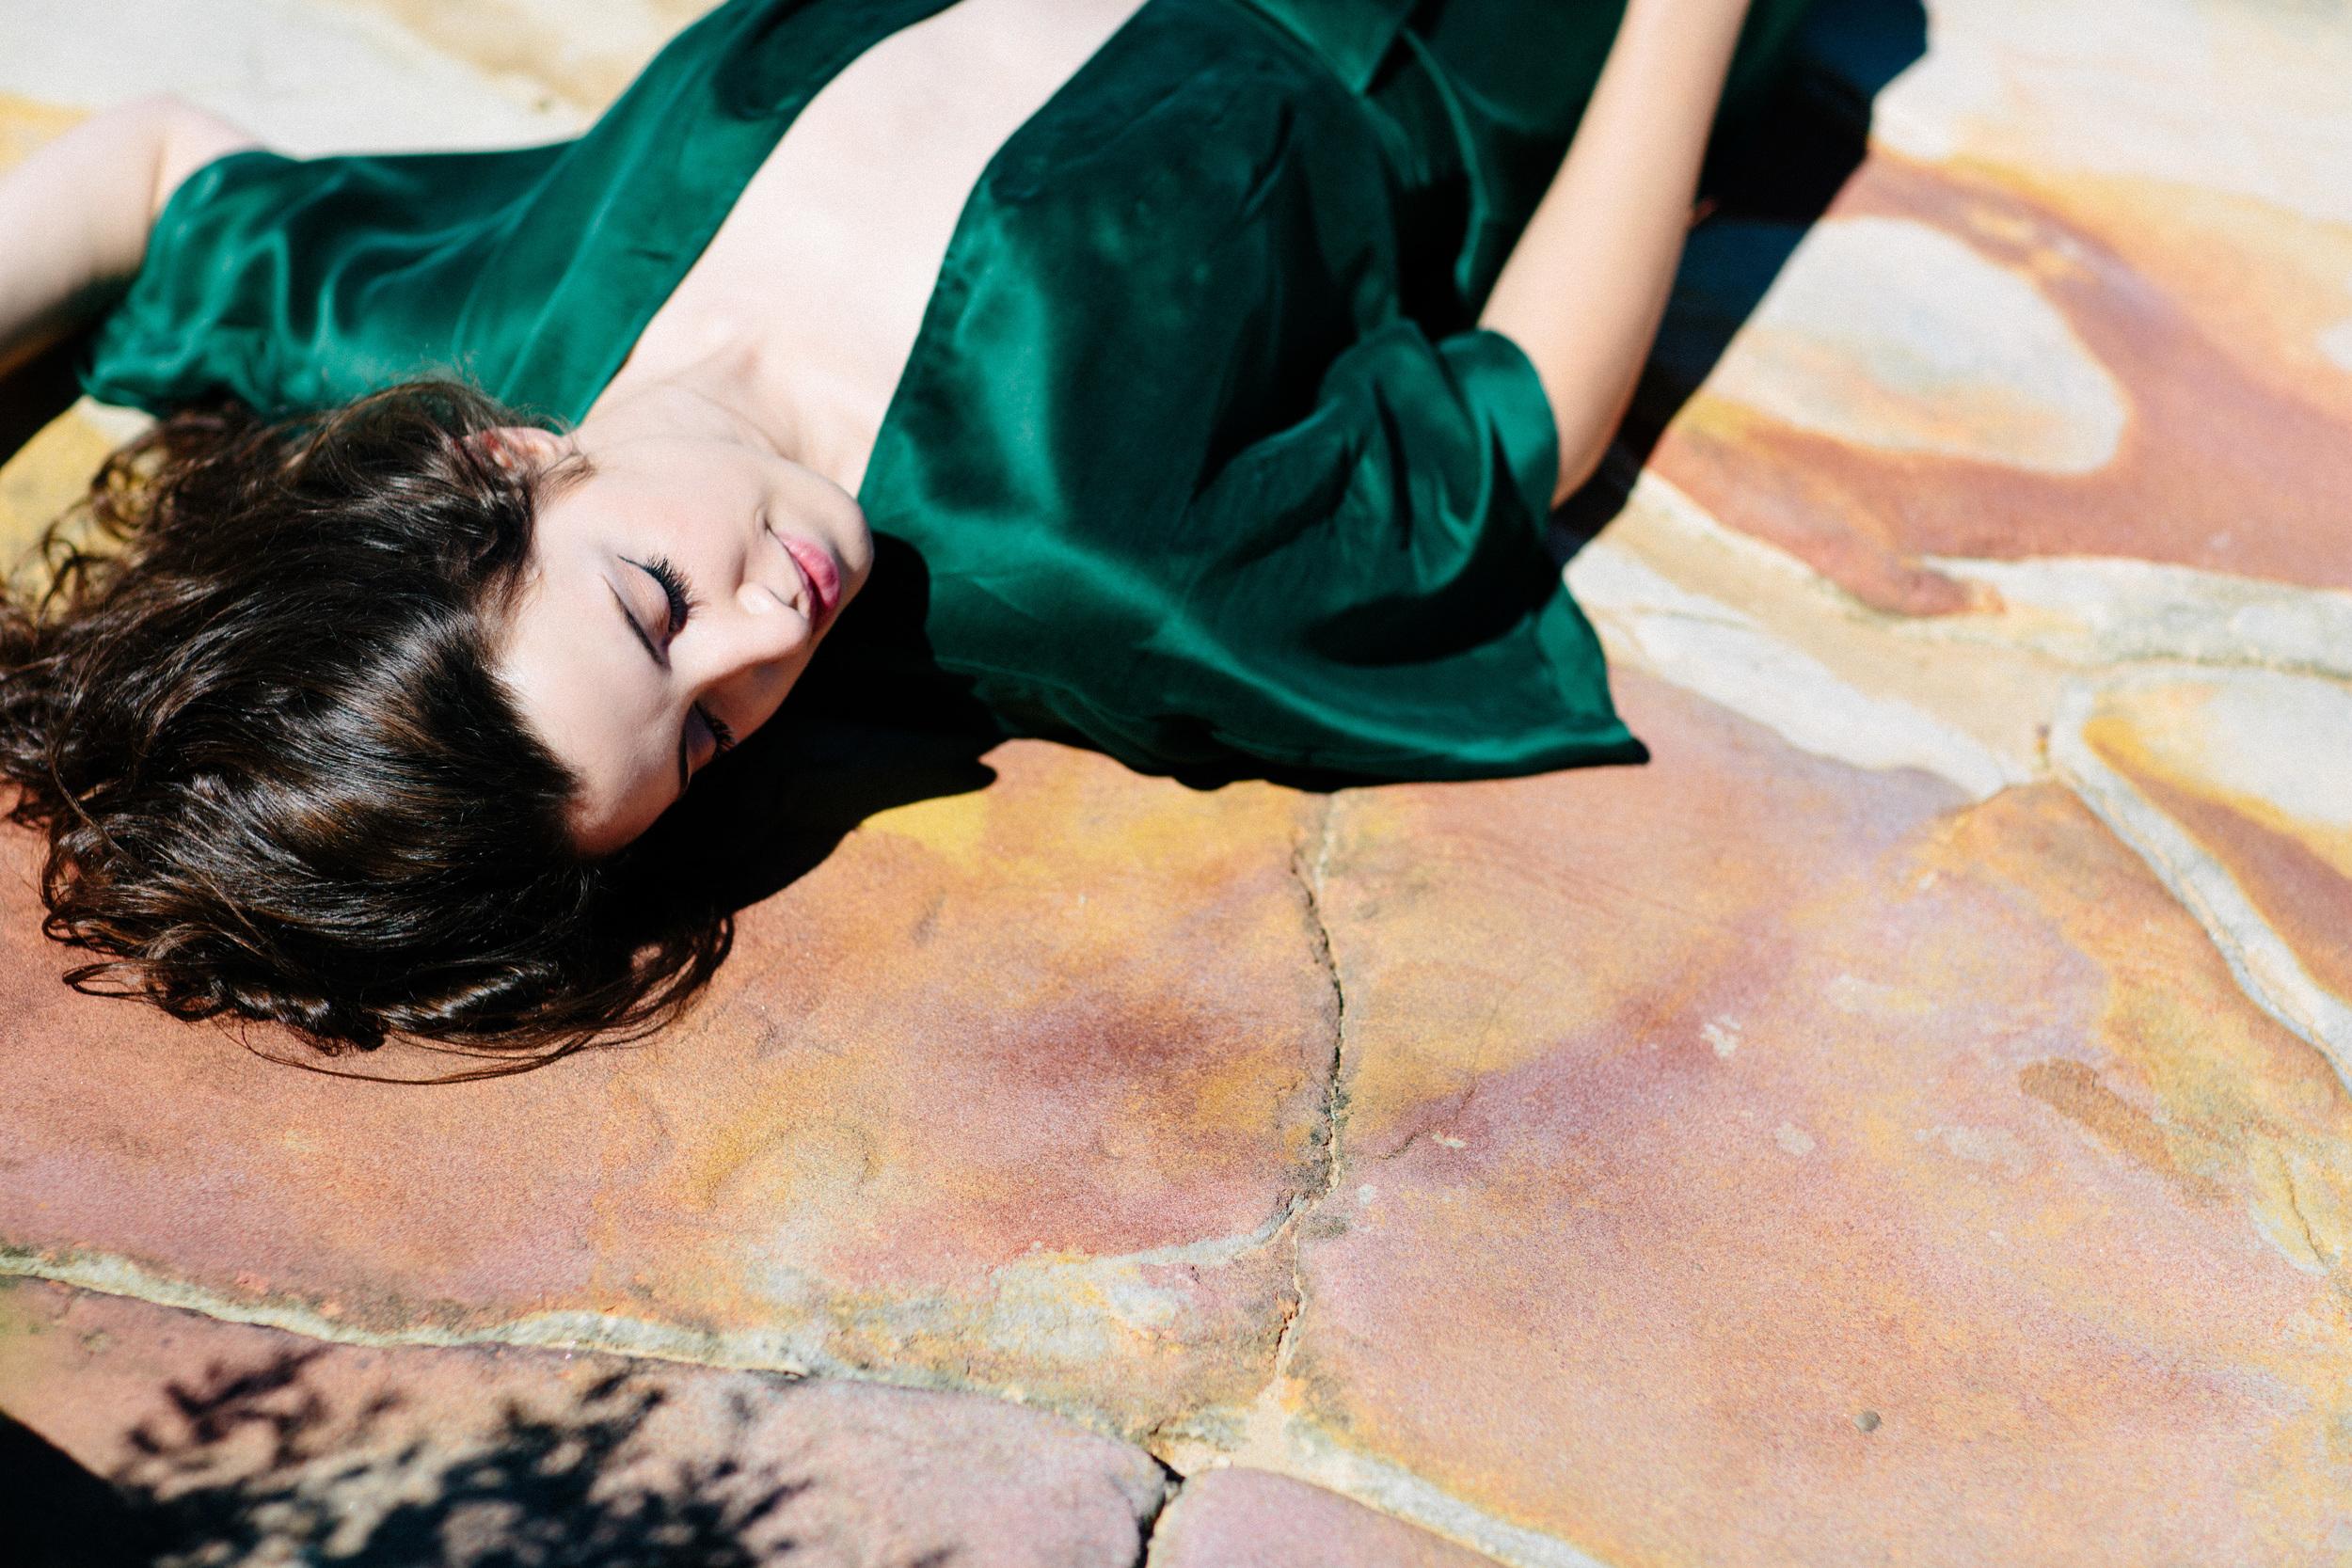 Paige-Newton-Imagery-fashion-photographer-sydney-editorial.jpg